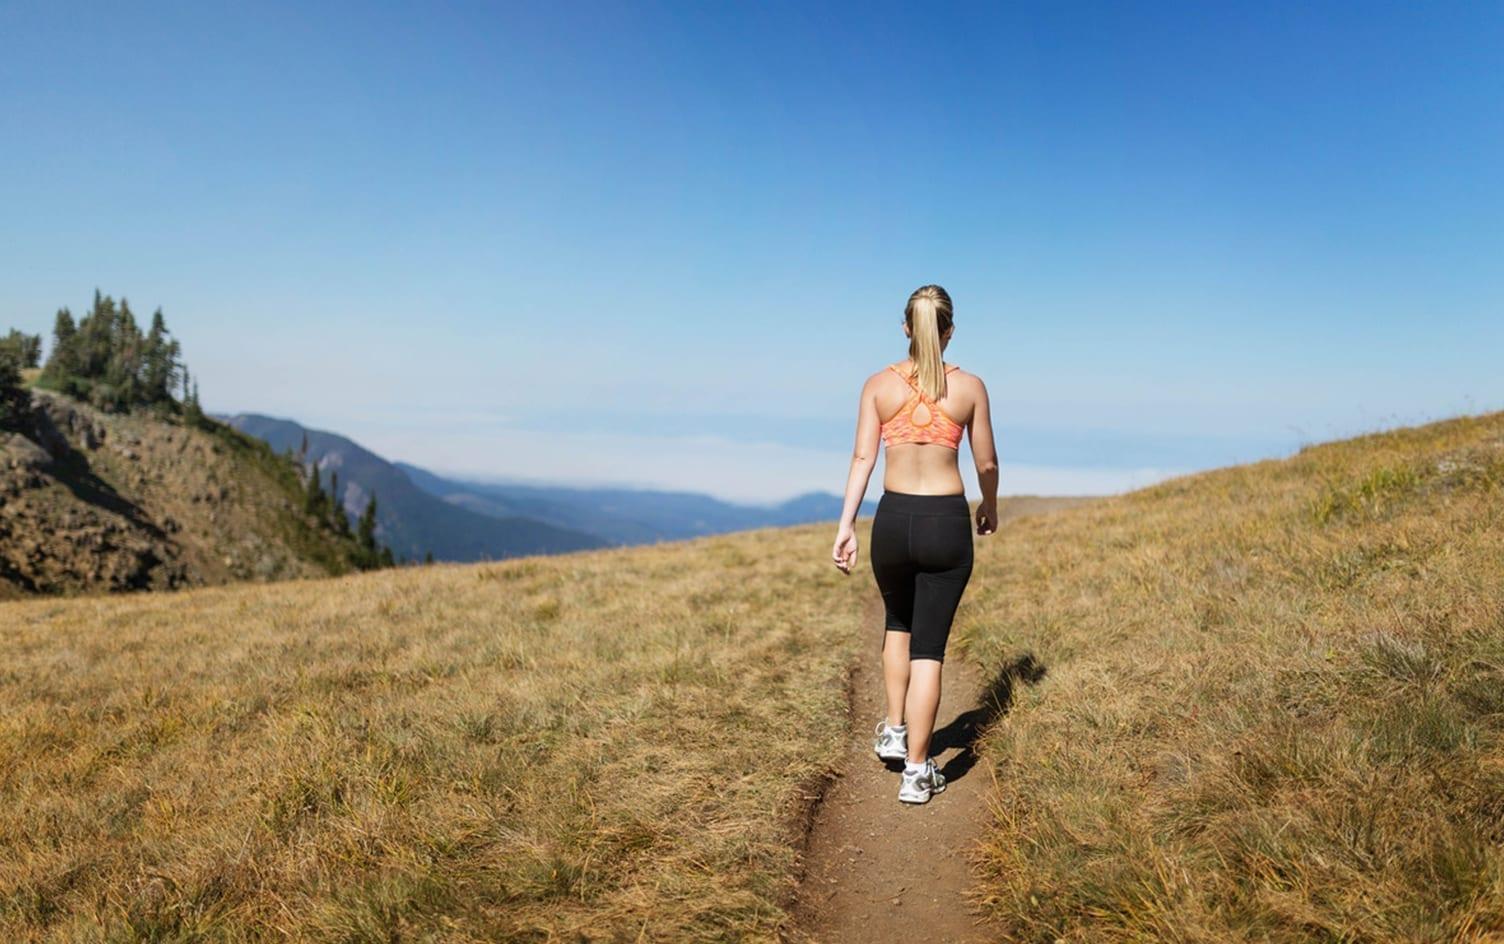 Walk in the Fat-Burning Zone to Blast Belly Fat | Walking | MyFitnessPal